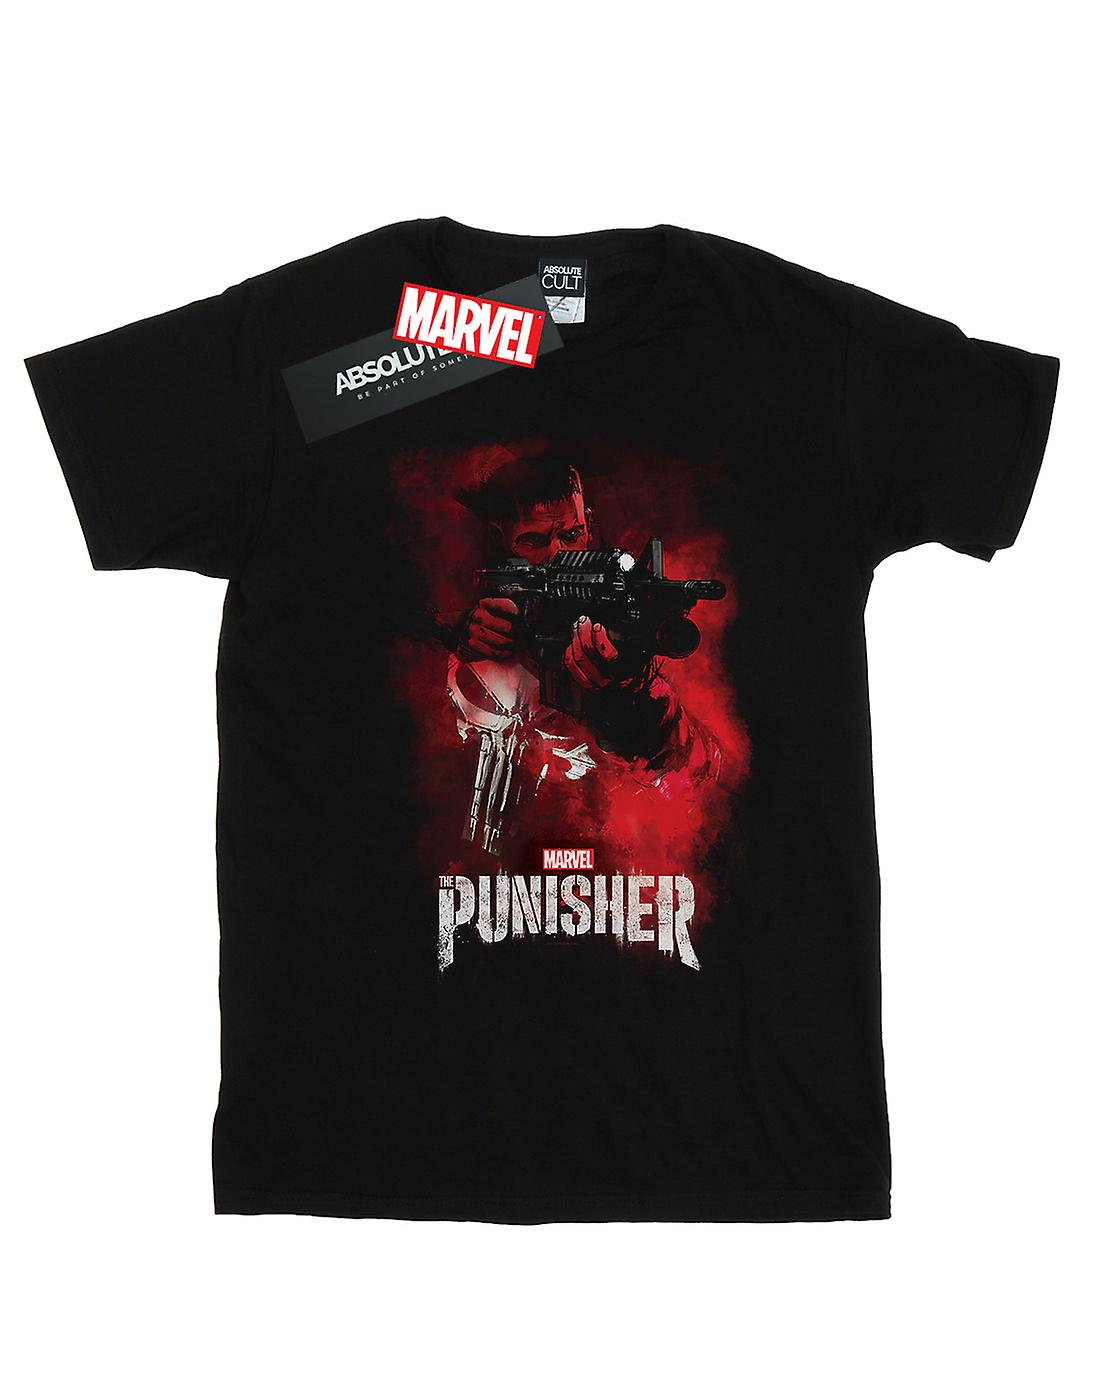 Marvel Women's The Punisher TV Series Red Smoke Boyfriend Fit T-Shirt